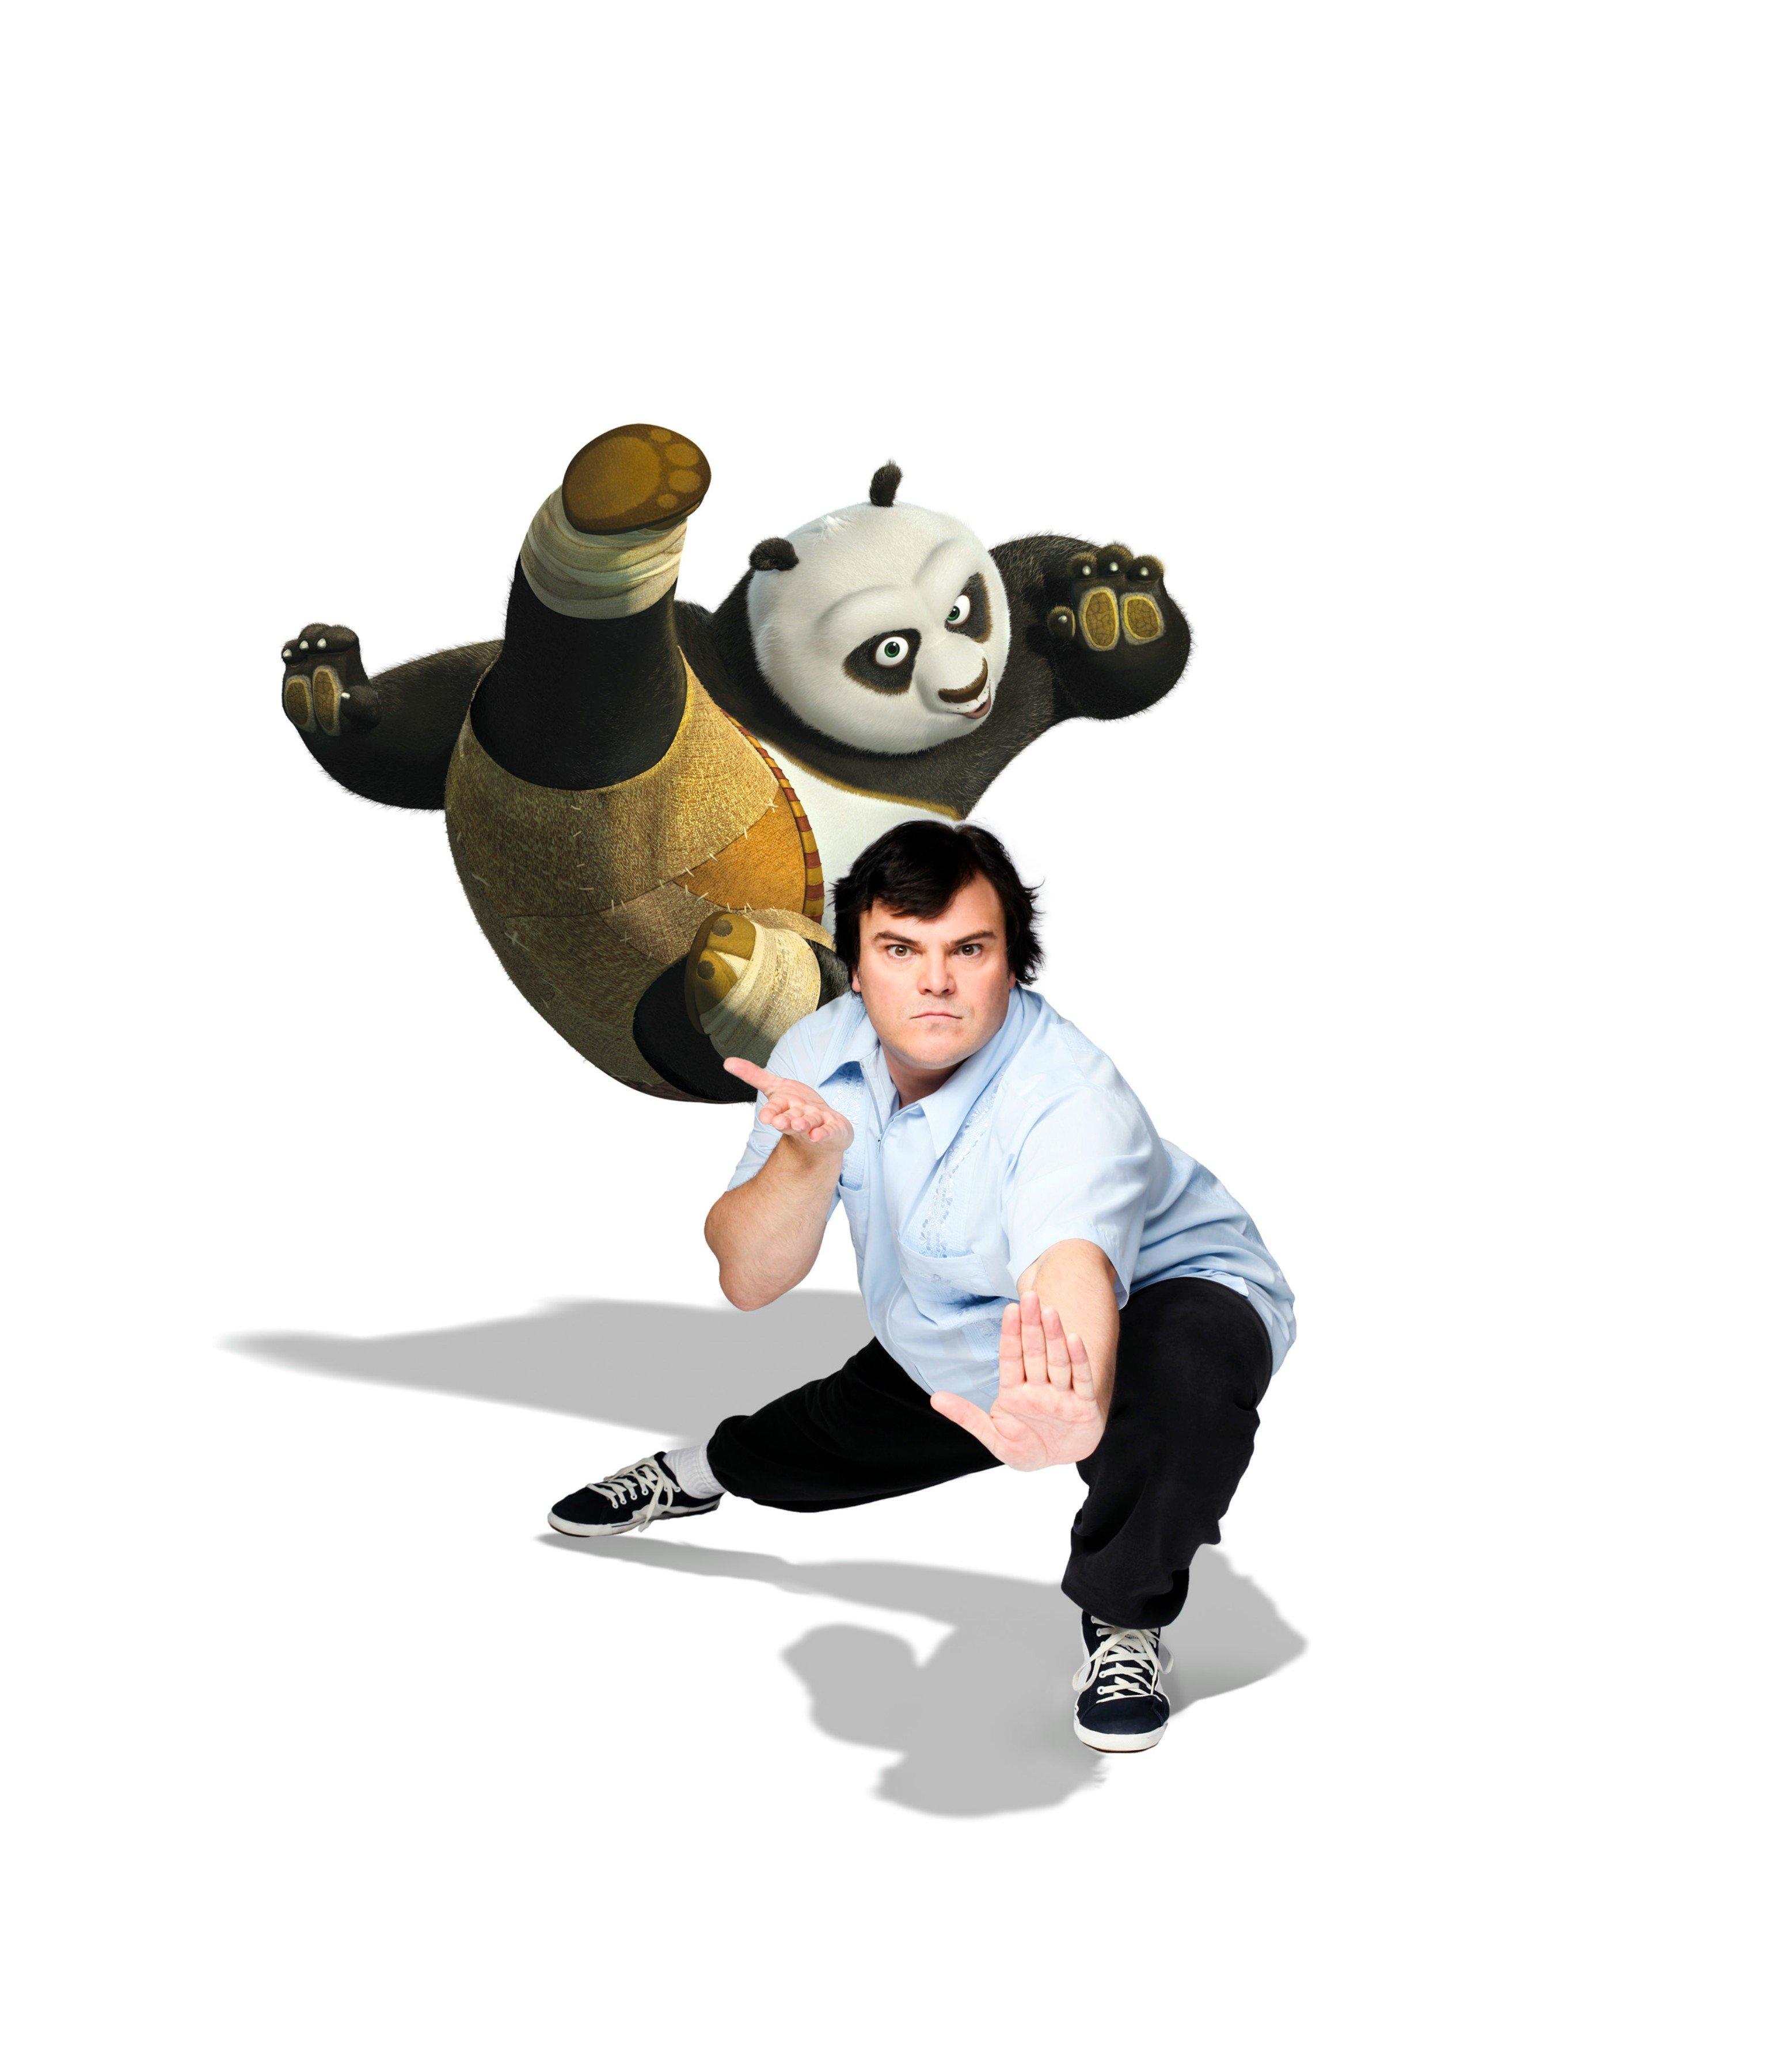 кунг -фу панда 2 смотреть онлайн бесплатно: